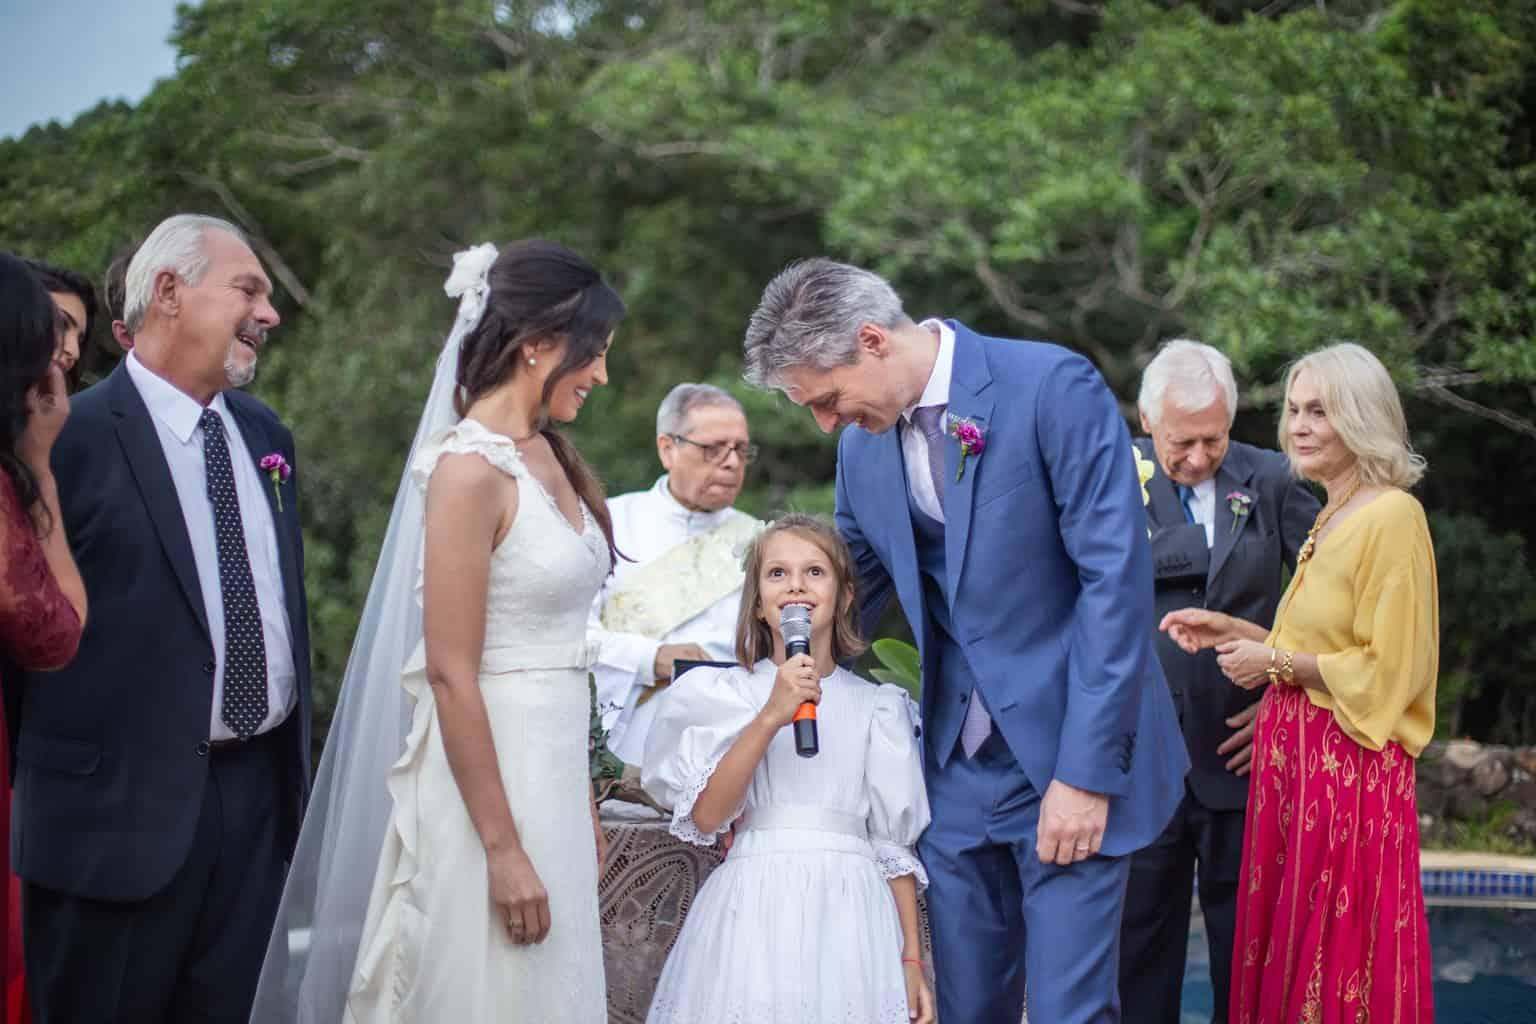 casamento-na-serra-cerimonia-ao-ar-livre-Fotografia-Laura-Campanella-graviola-filmes-Juliana-e-Sebastian-Pousada-La-Belle-Bruna256